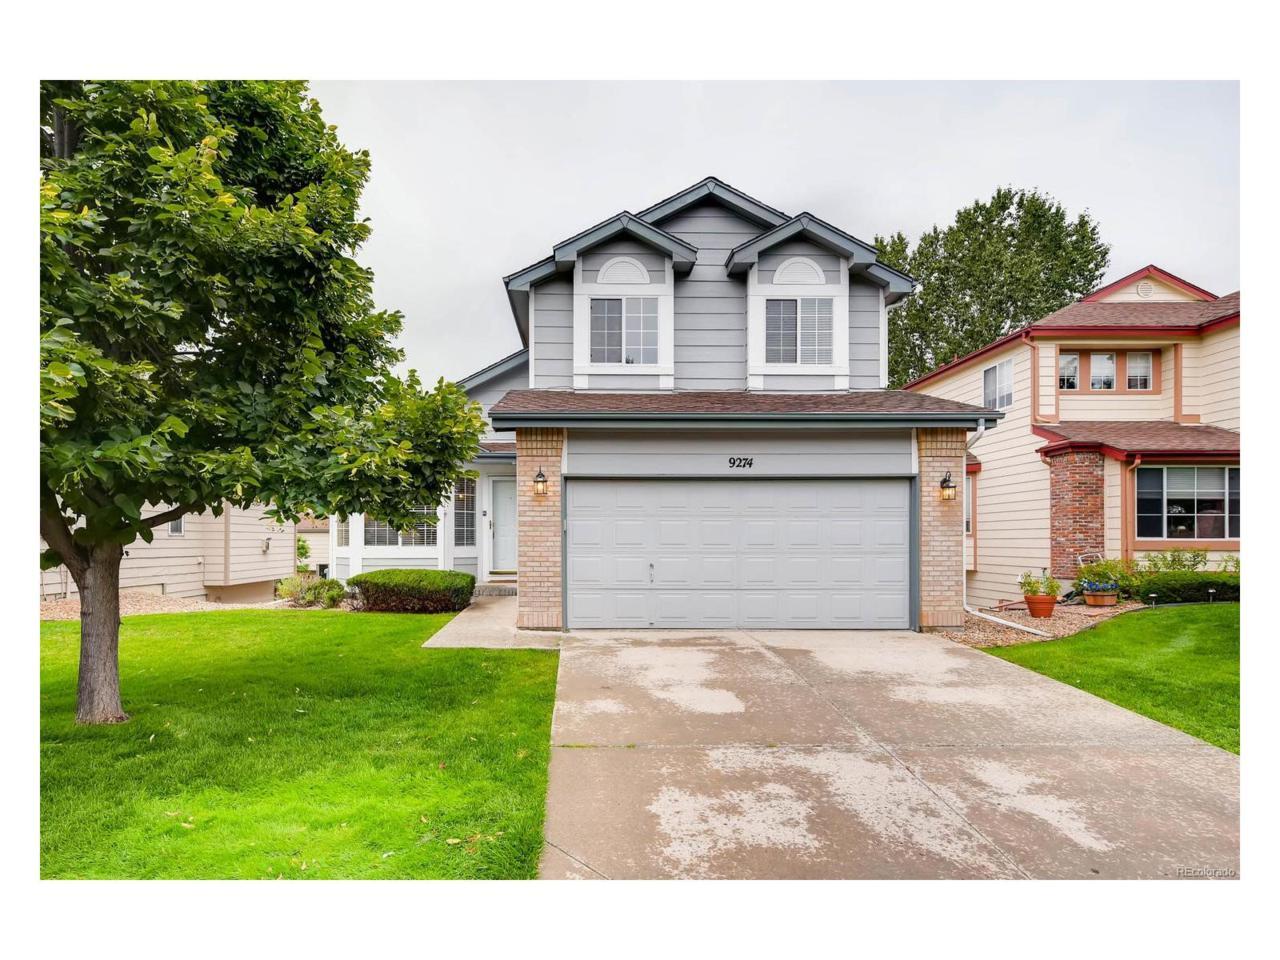 9274 W Hinsdale Place, Littleton, CO 80128 (MLS #7416047) :: 8z Real Estate